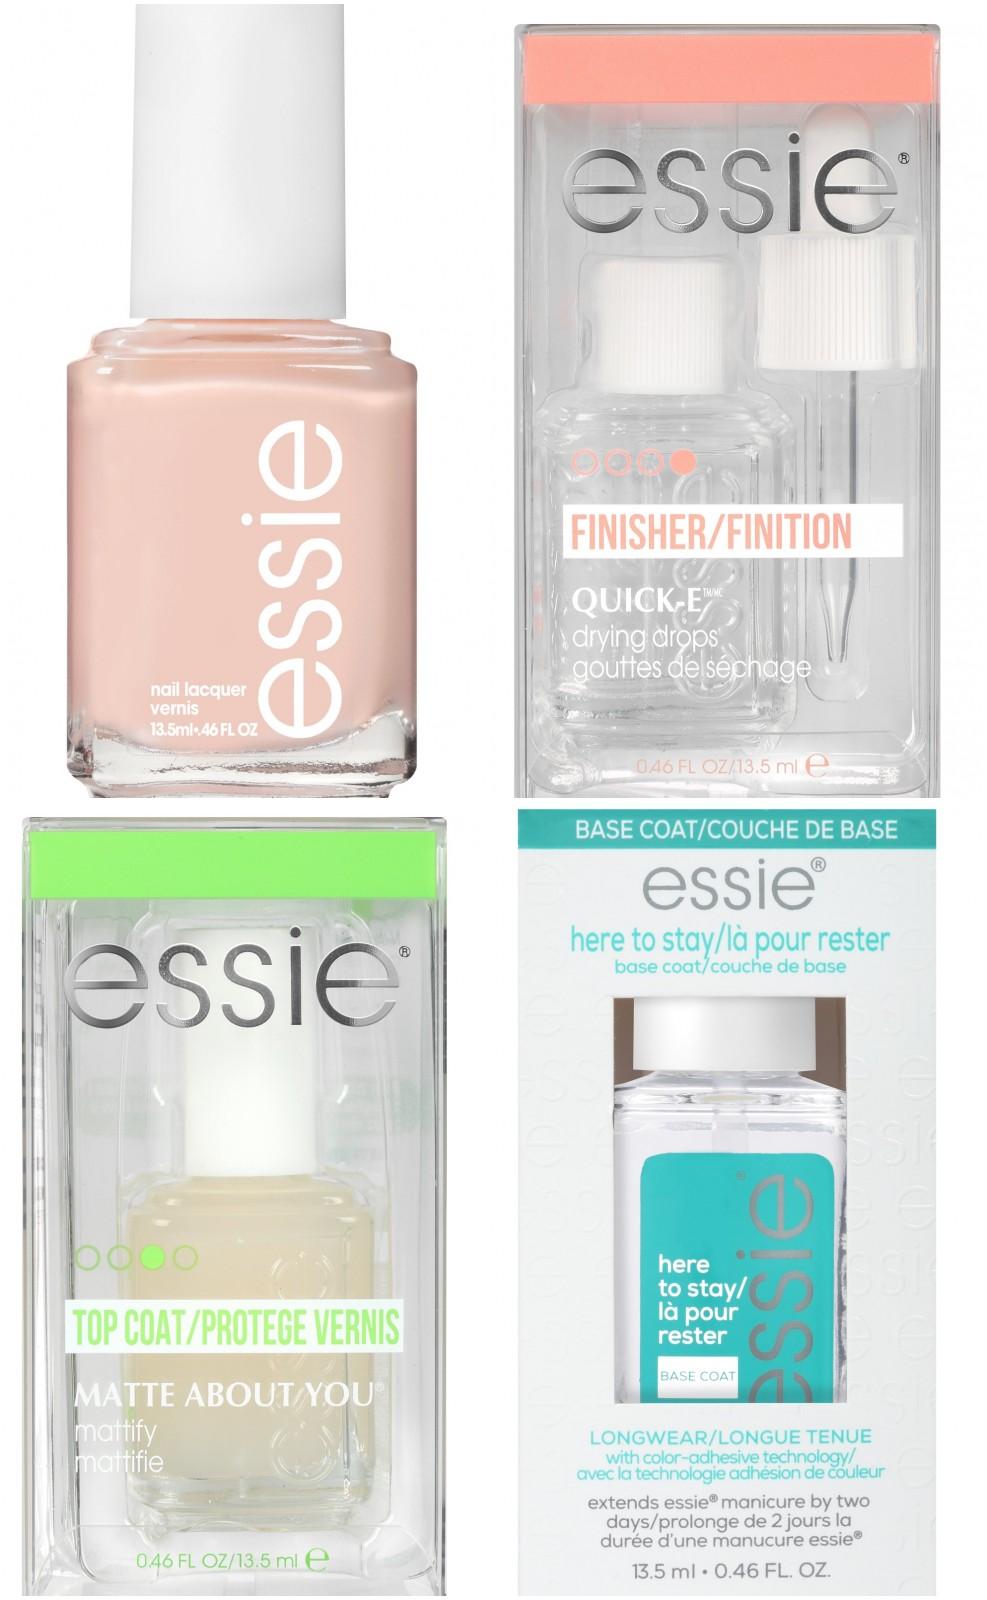 Essie-Base-Coat-Top-Coast-Quick-Dyring-Drops-amp-Mademoiselle-Sheer-Nail-Polish